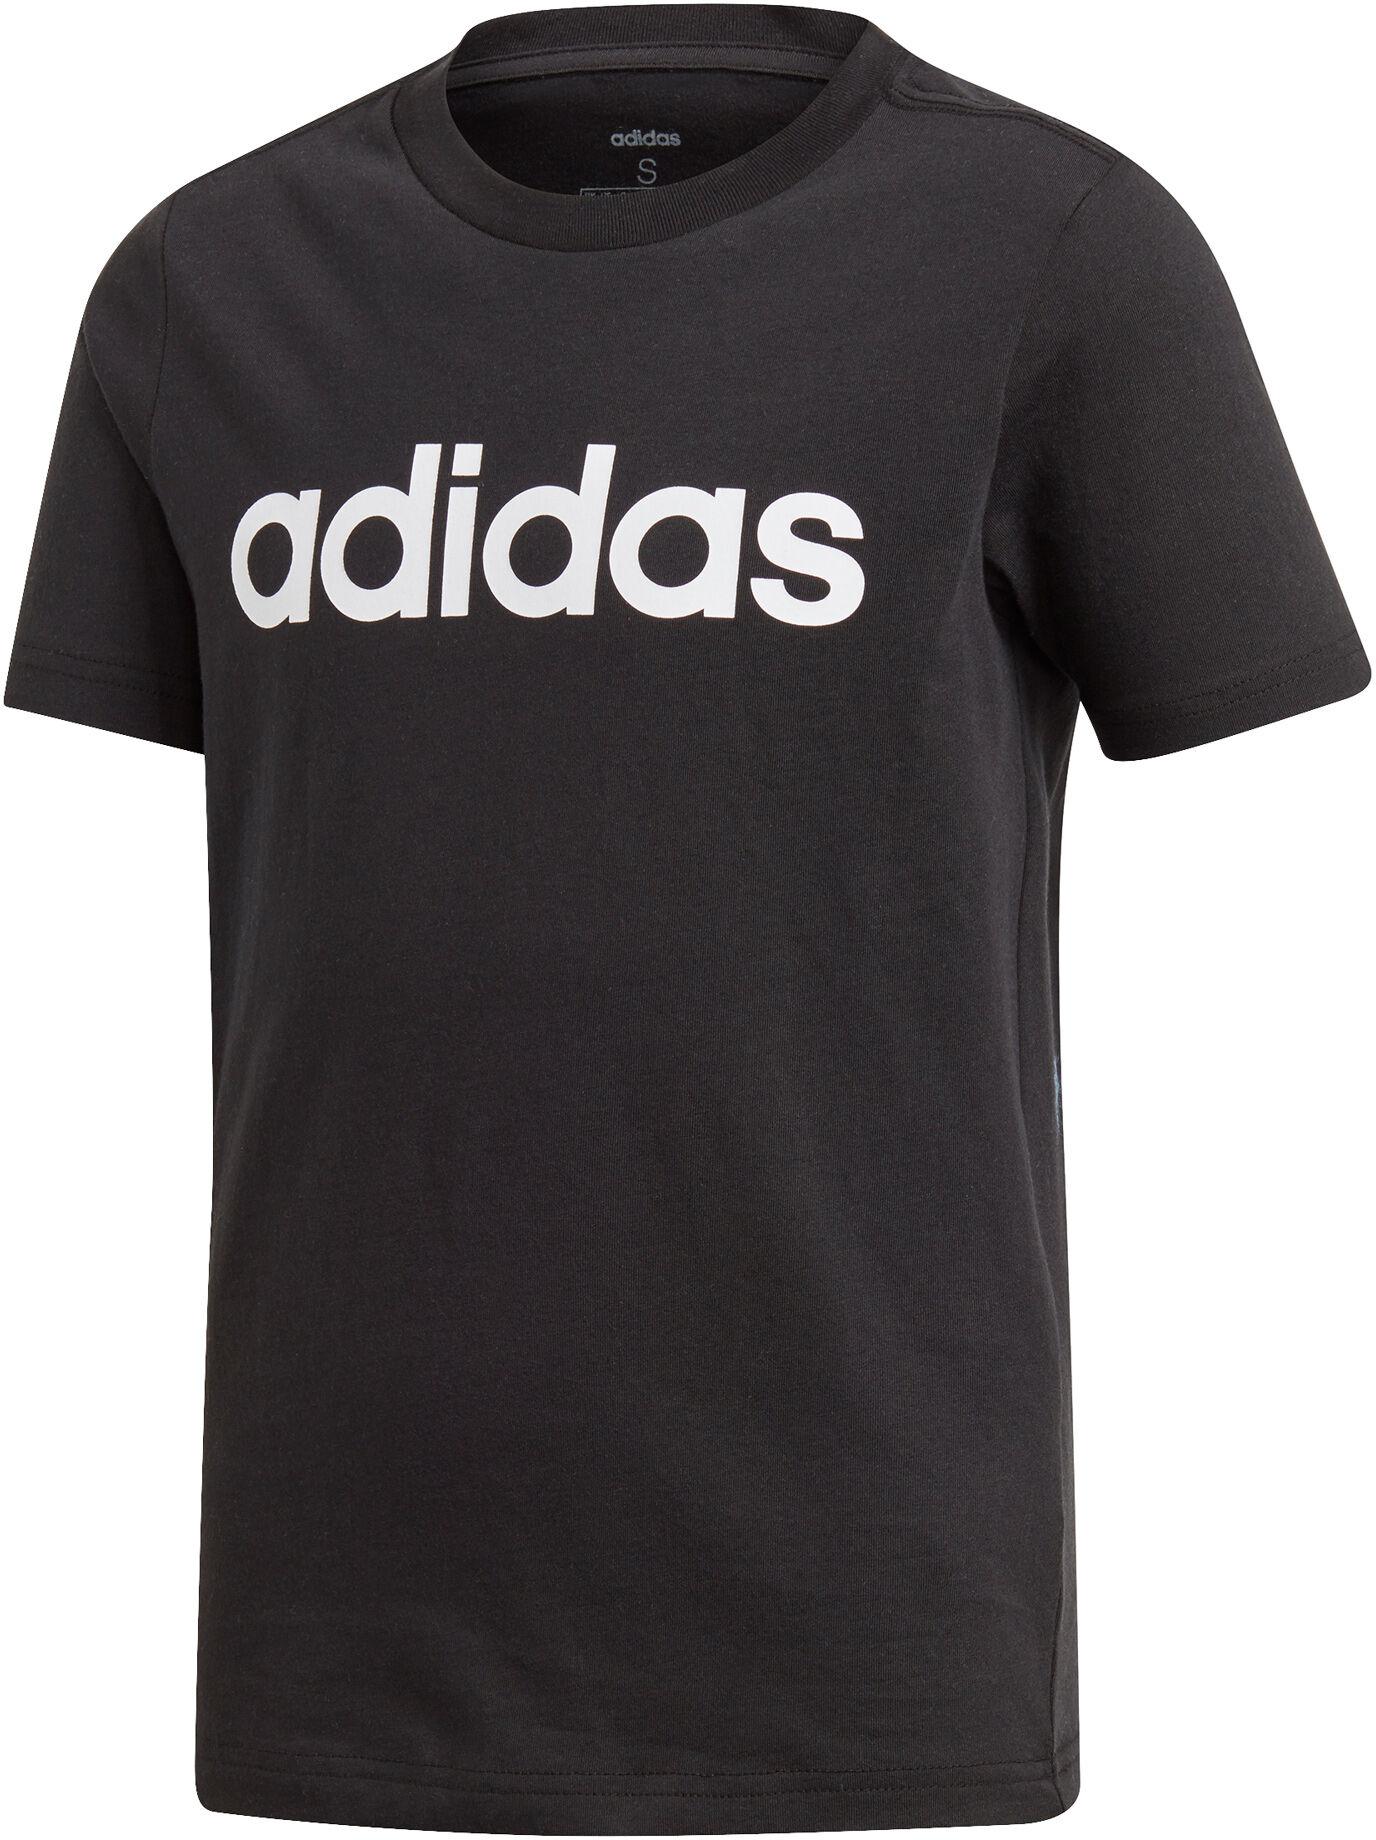 adidas sko størrelsesguide, ADIDAS PERFORMANCE T shirts